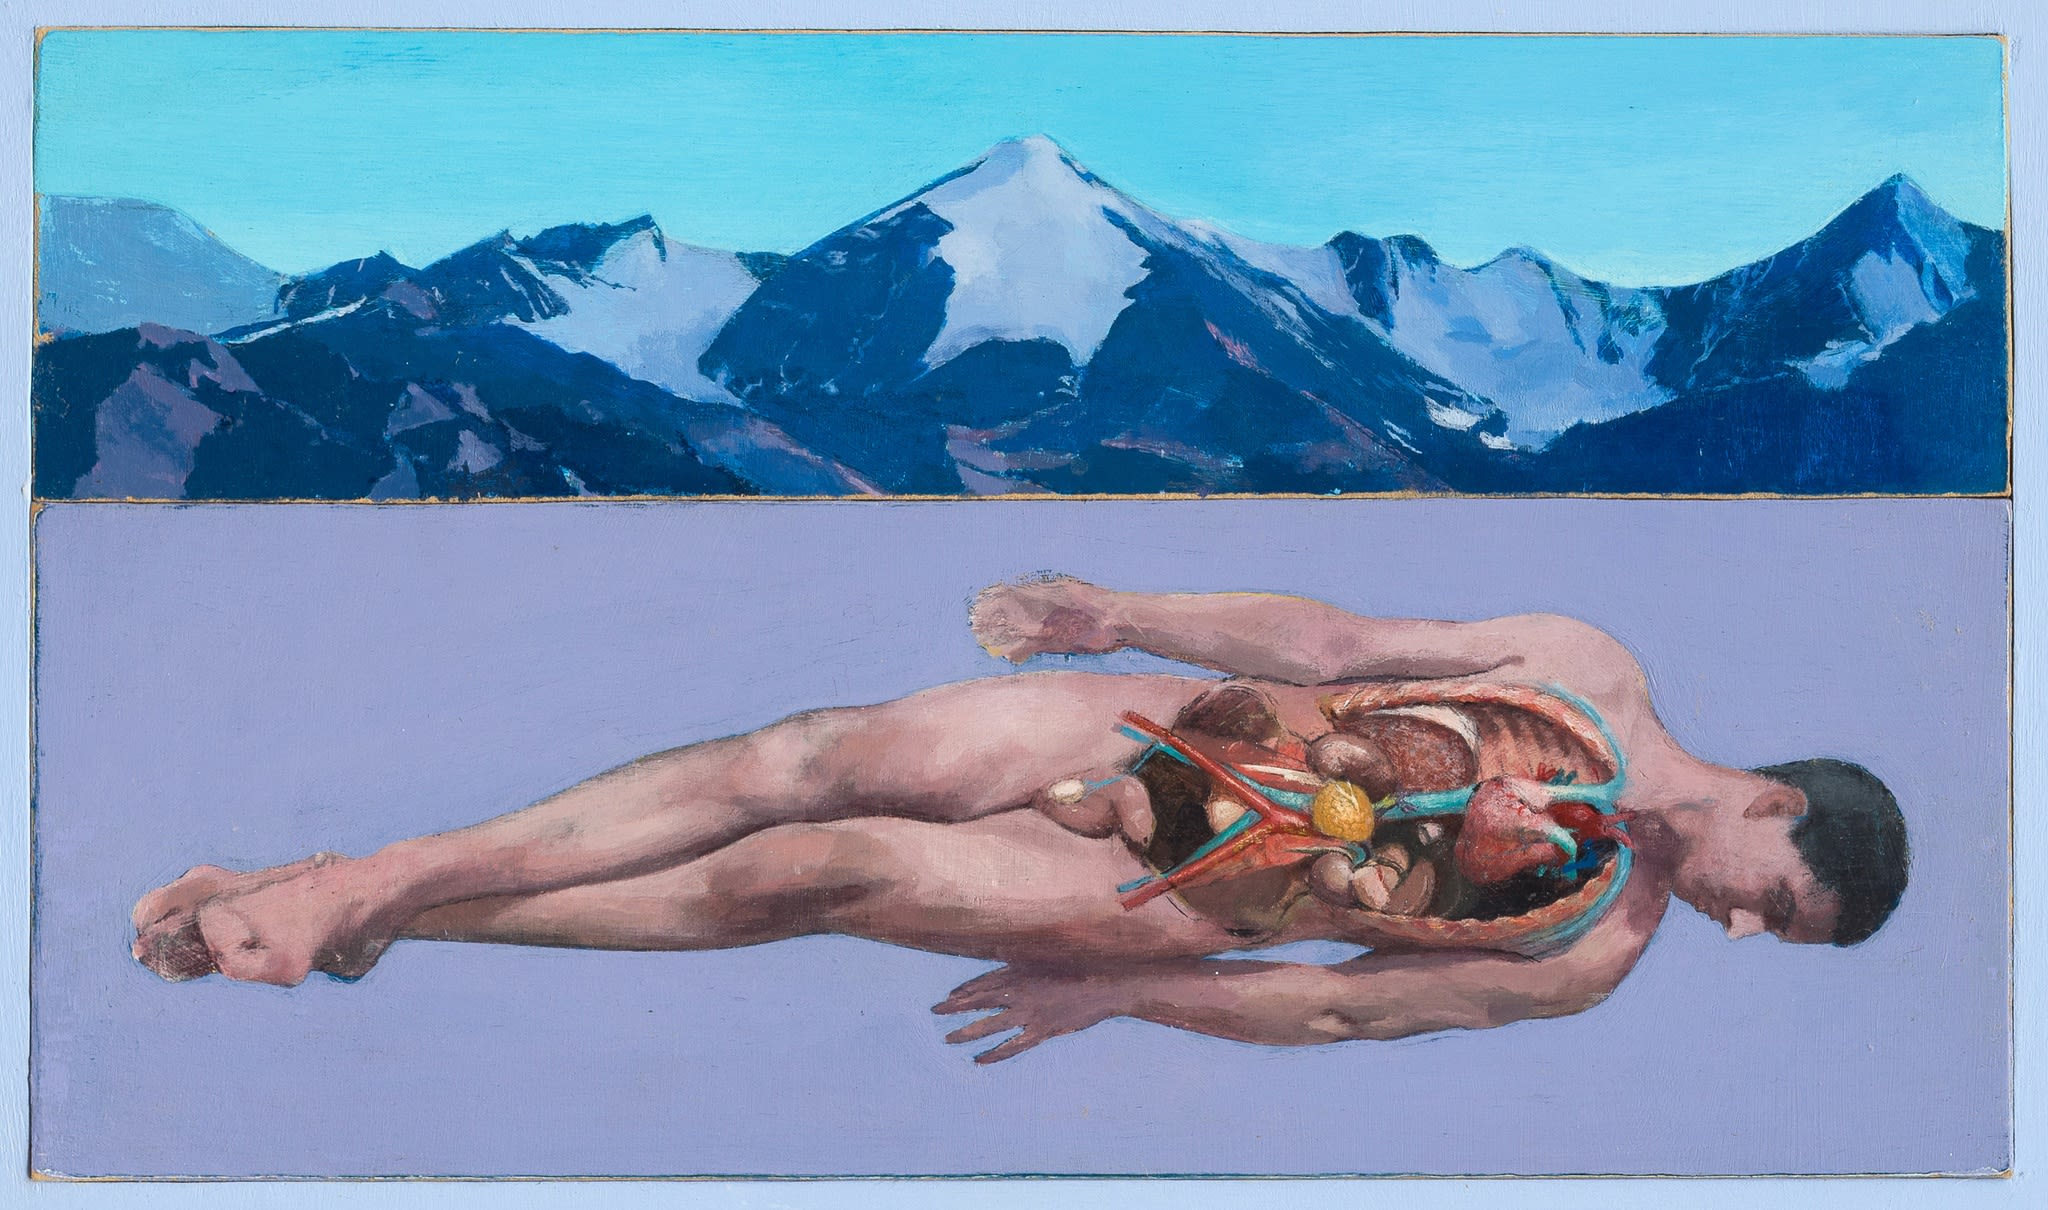 "<span class=""link fancybox-details-link""><a href=""/artists/65-simon-turner/works/619-simon-turner-prometheus-2013/"">View Detail Page</a></span><div class=""artist""><strong>Simon Turner</strong></div> b. 1973 <div class=""title""><em>Prometheus</em>, 2013</div> <div class=""medium"">acrylic on board</div> <div class=""dimensions"">h. 24 x w. 41 cm</div><div class=""price"">£650.00</div><div class=""copyright_line"">£ 65 x 10 Months, OwnArt 0% APR</div>"